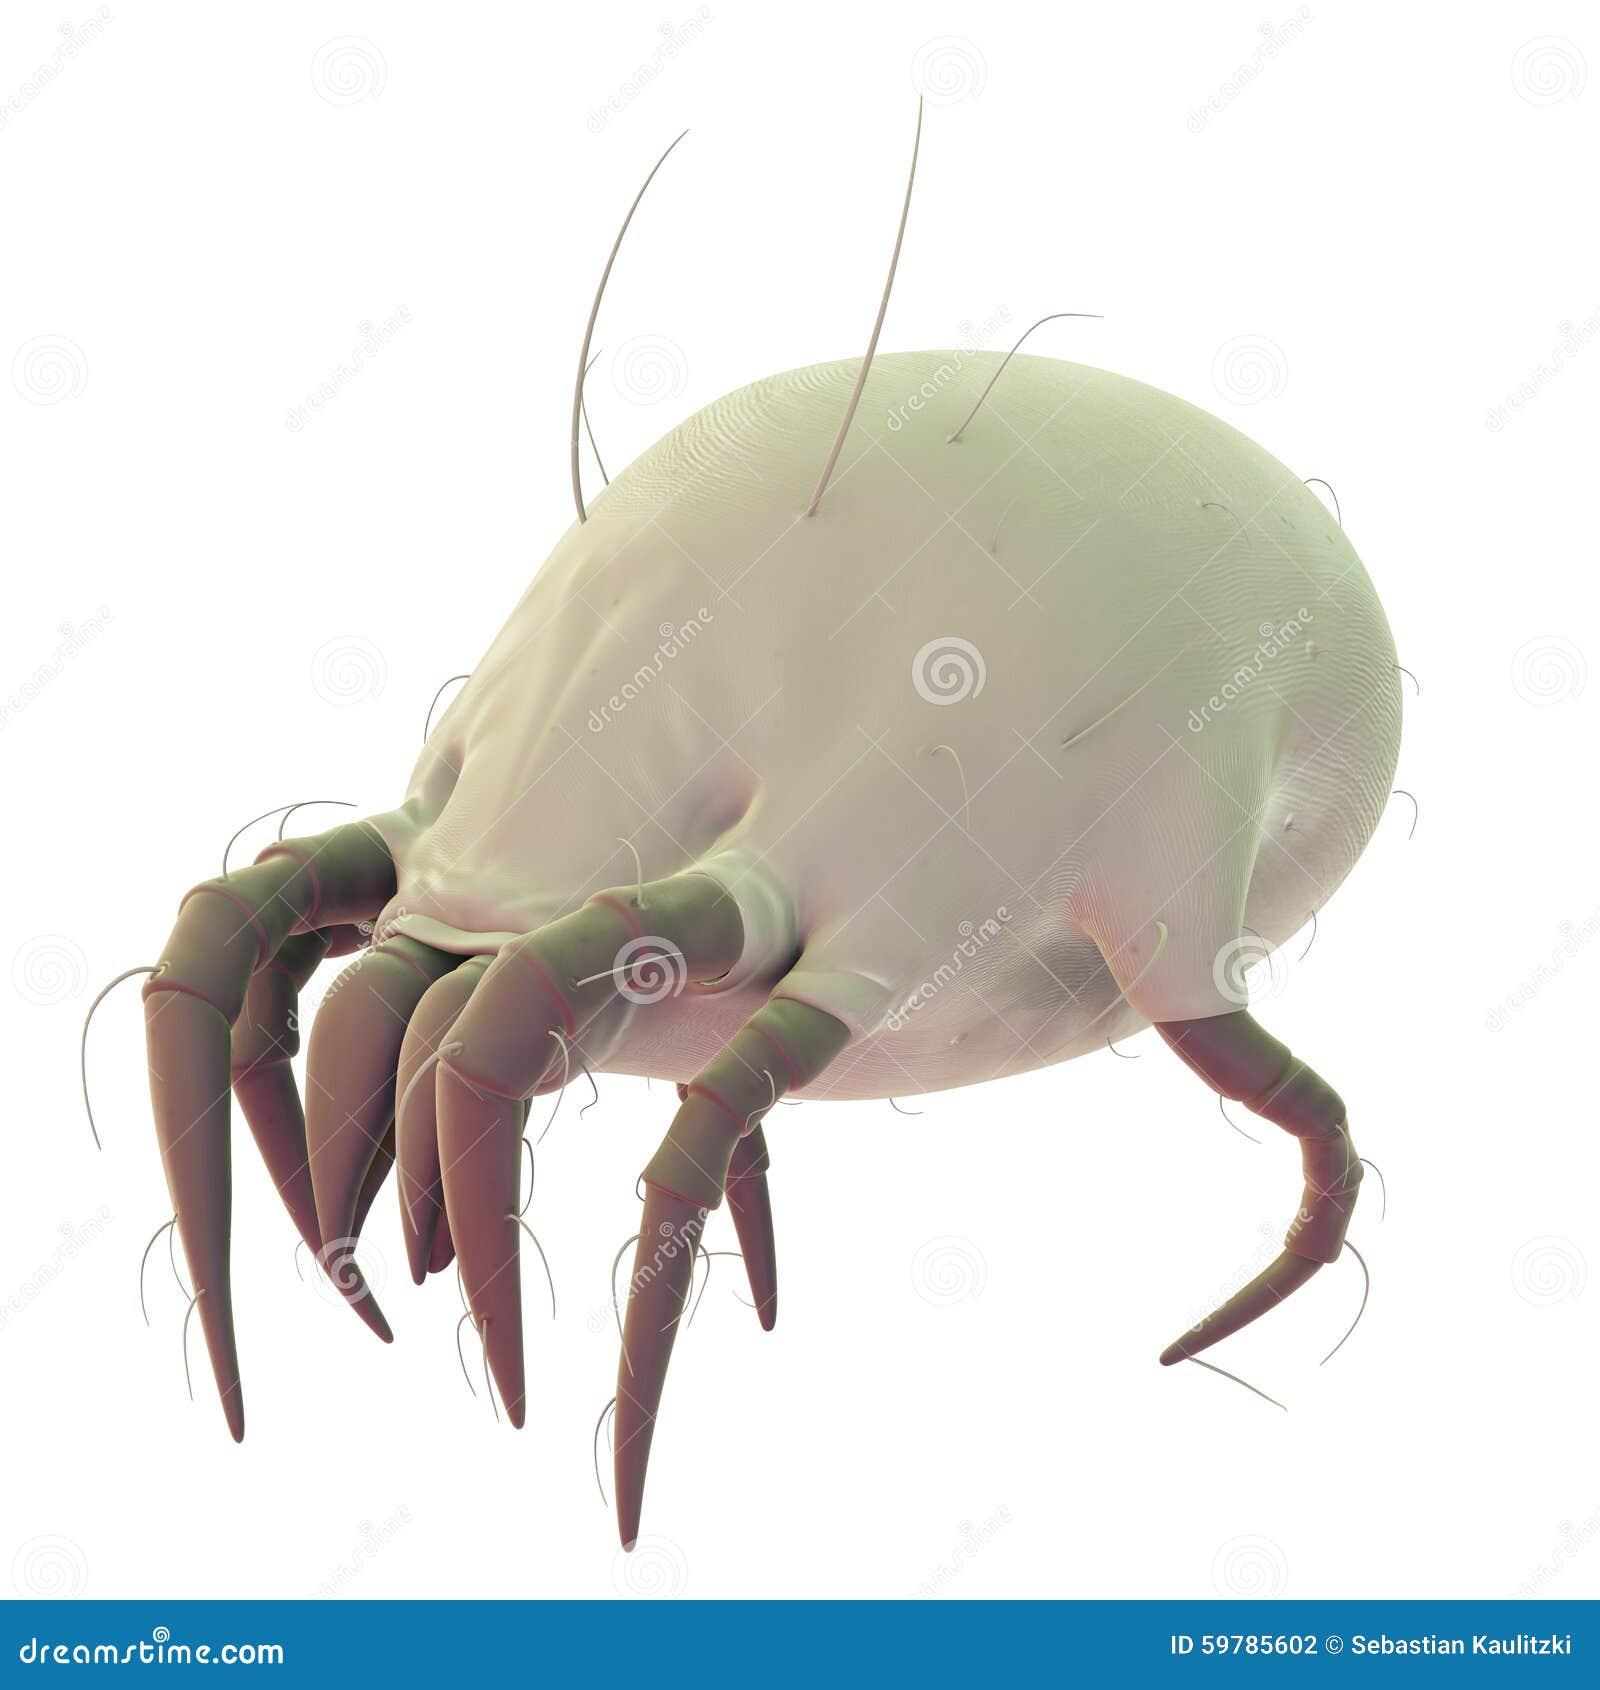 A common dust mite